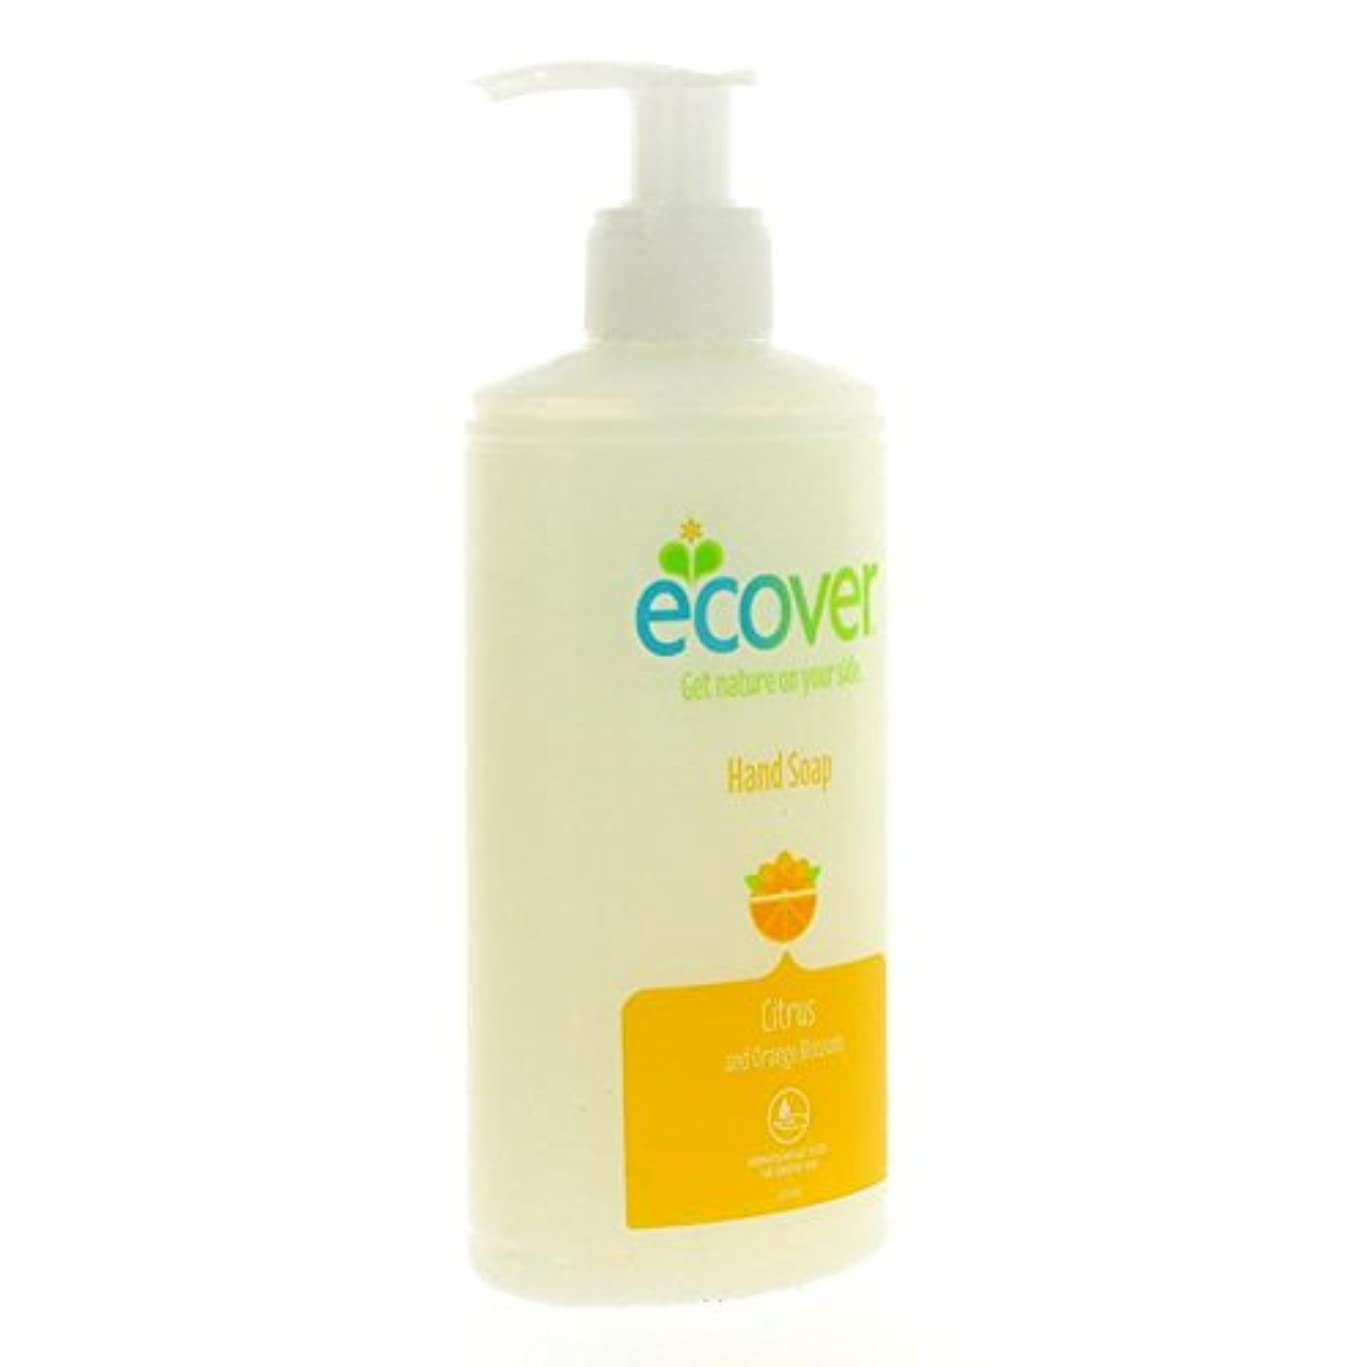 Ecover - Hand Soap - Citrus and Orange Blossom - 250ml (Case of 6)